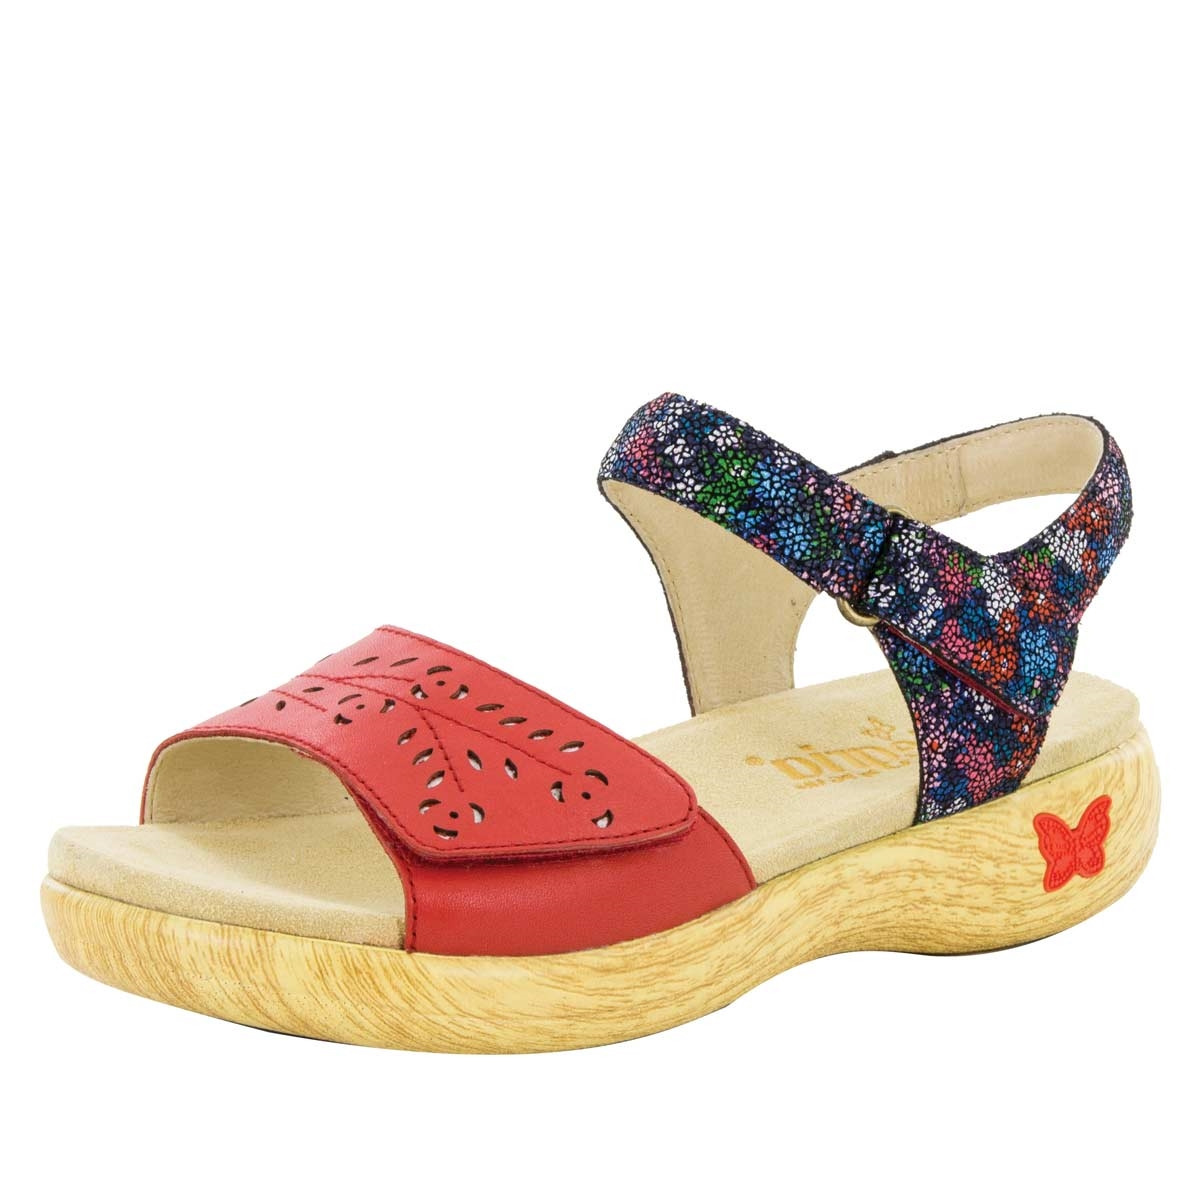 cbf299027ae Jesa Botanicool - Alegria Shoes